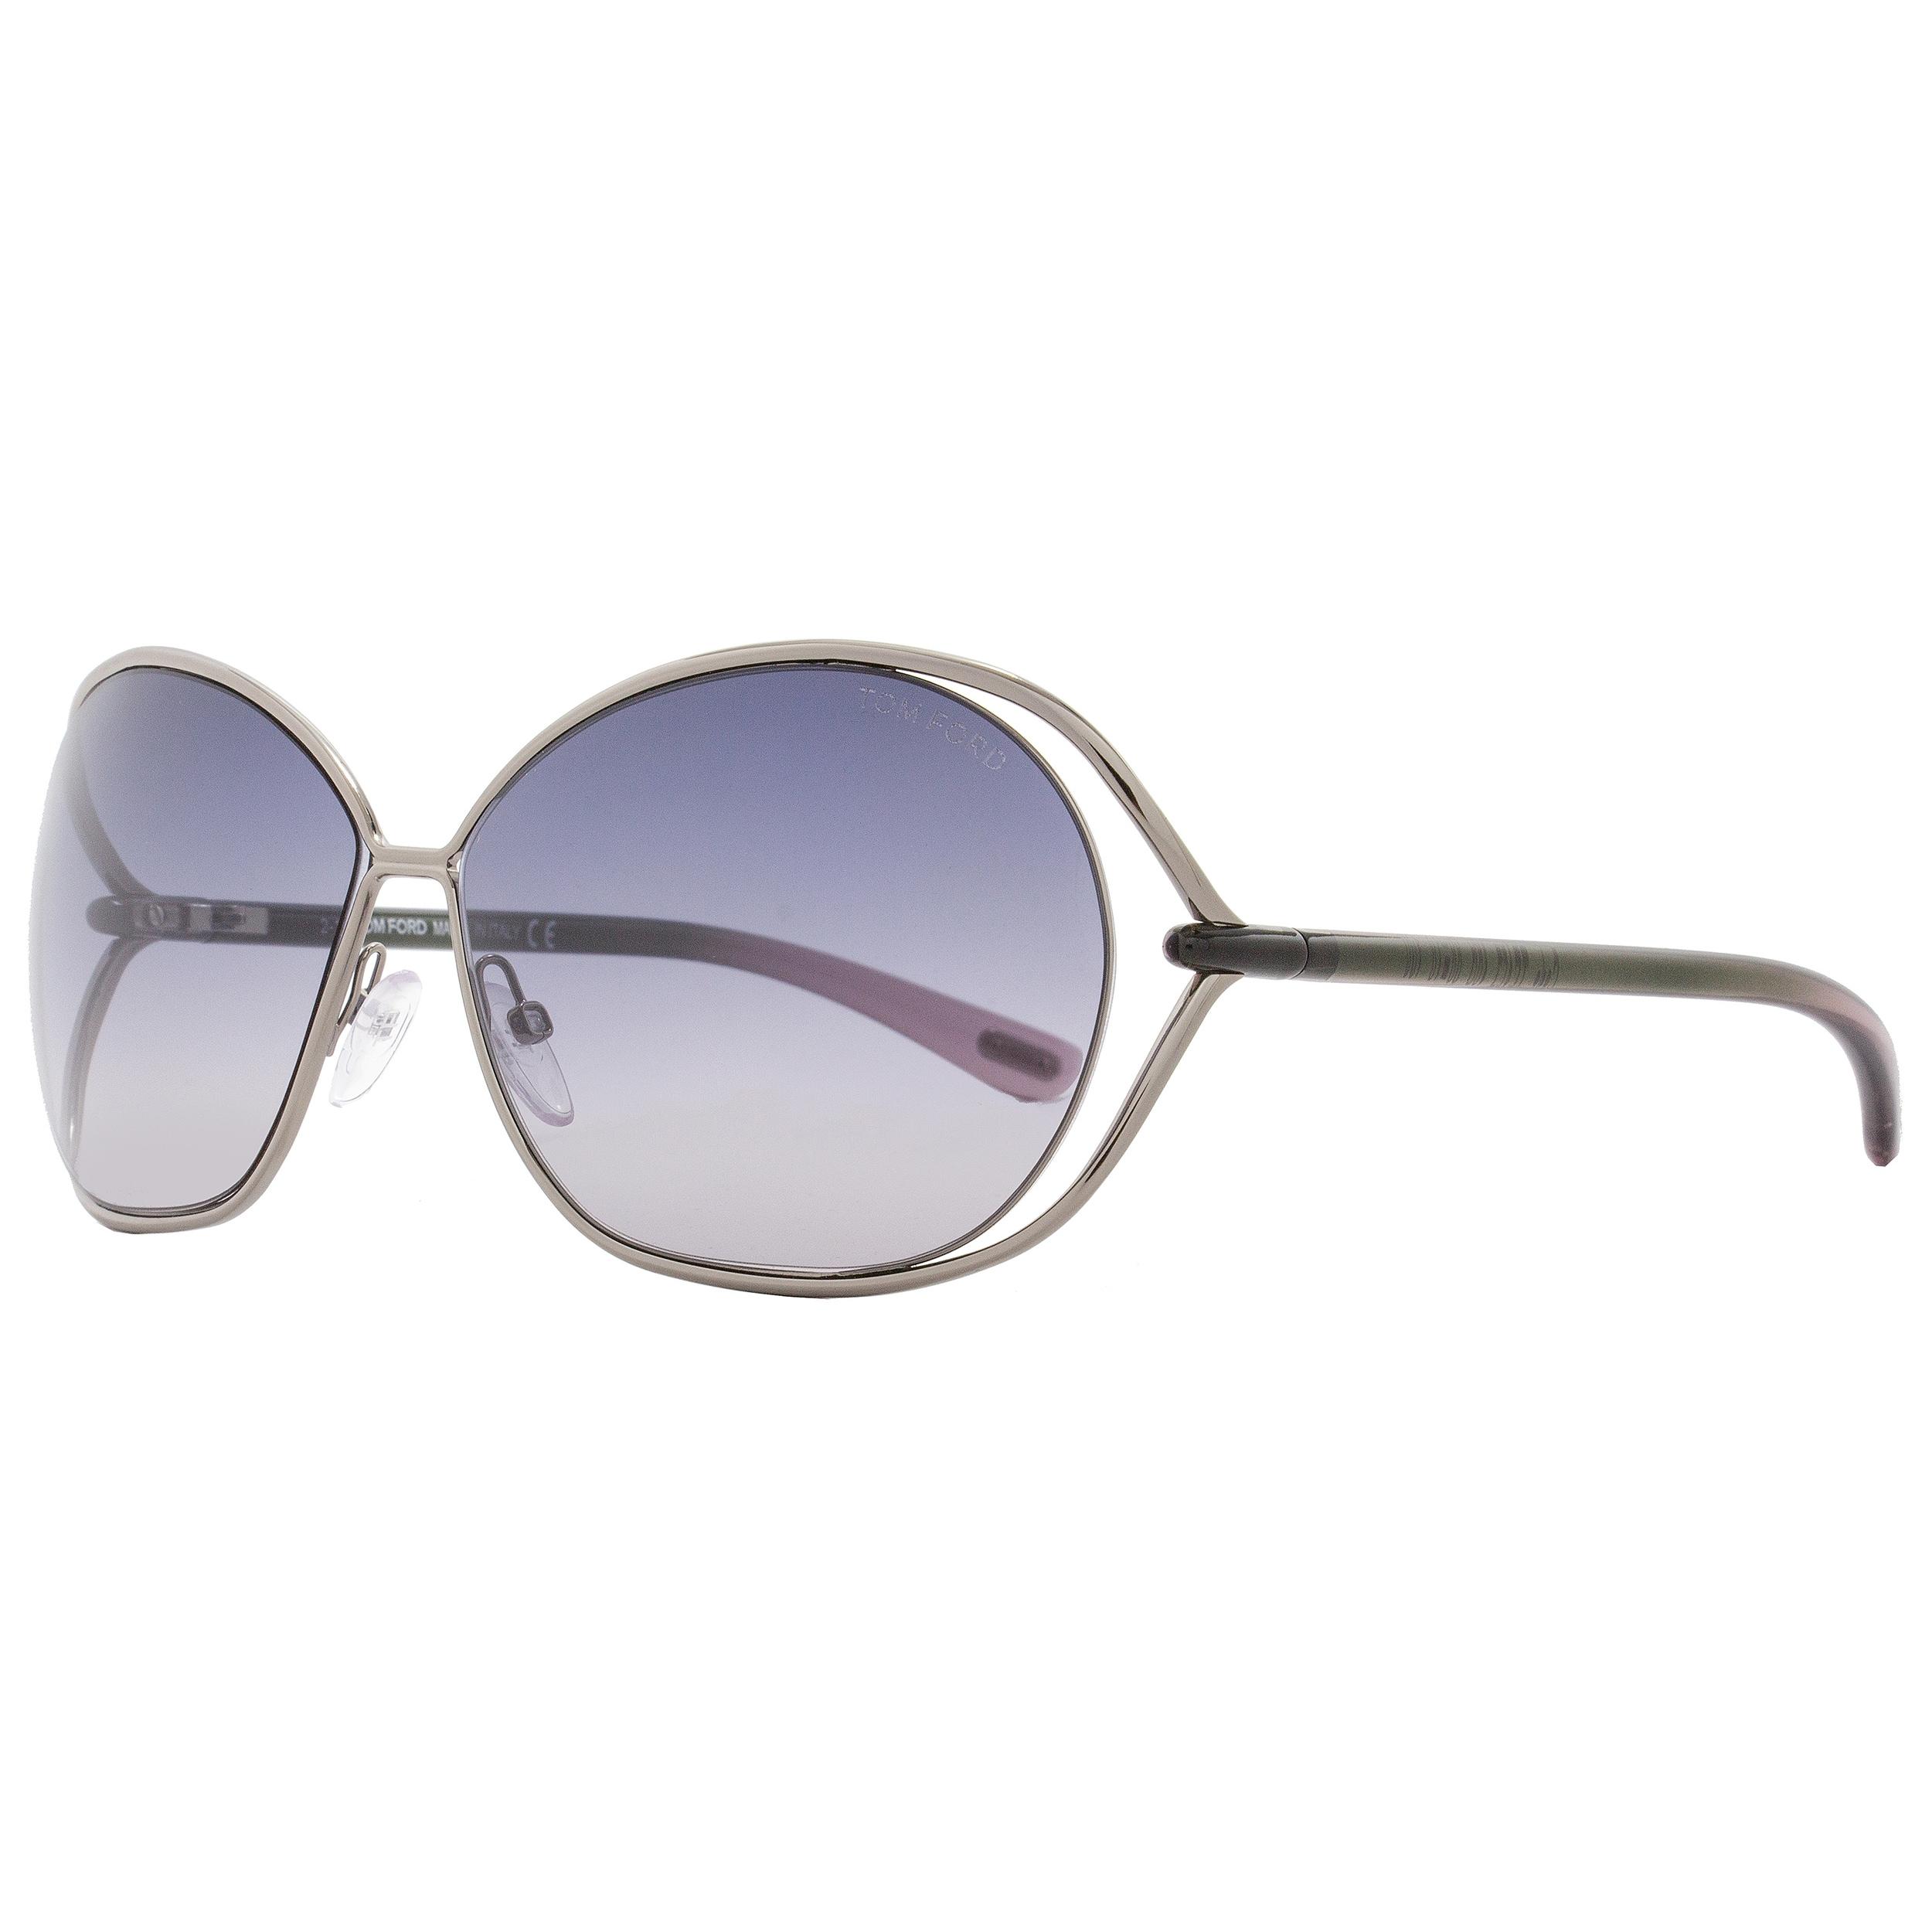 e4c731faea Shop Tom Ford TF157 Carla 10B Women s Nickeltin Rose Gray Gray Gradient  Lens Sunglasses - Free Shipping Today - Overstock - 18153196